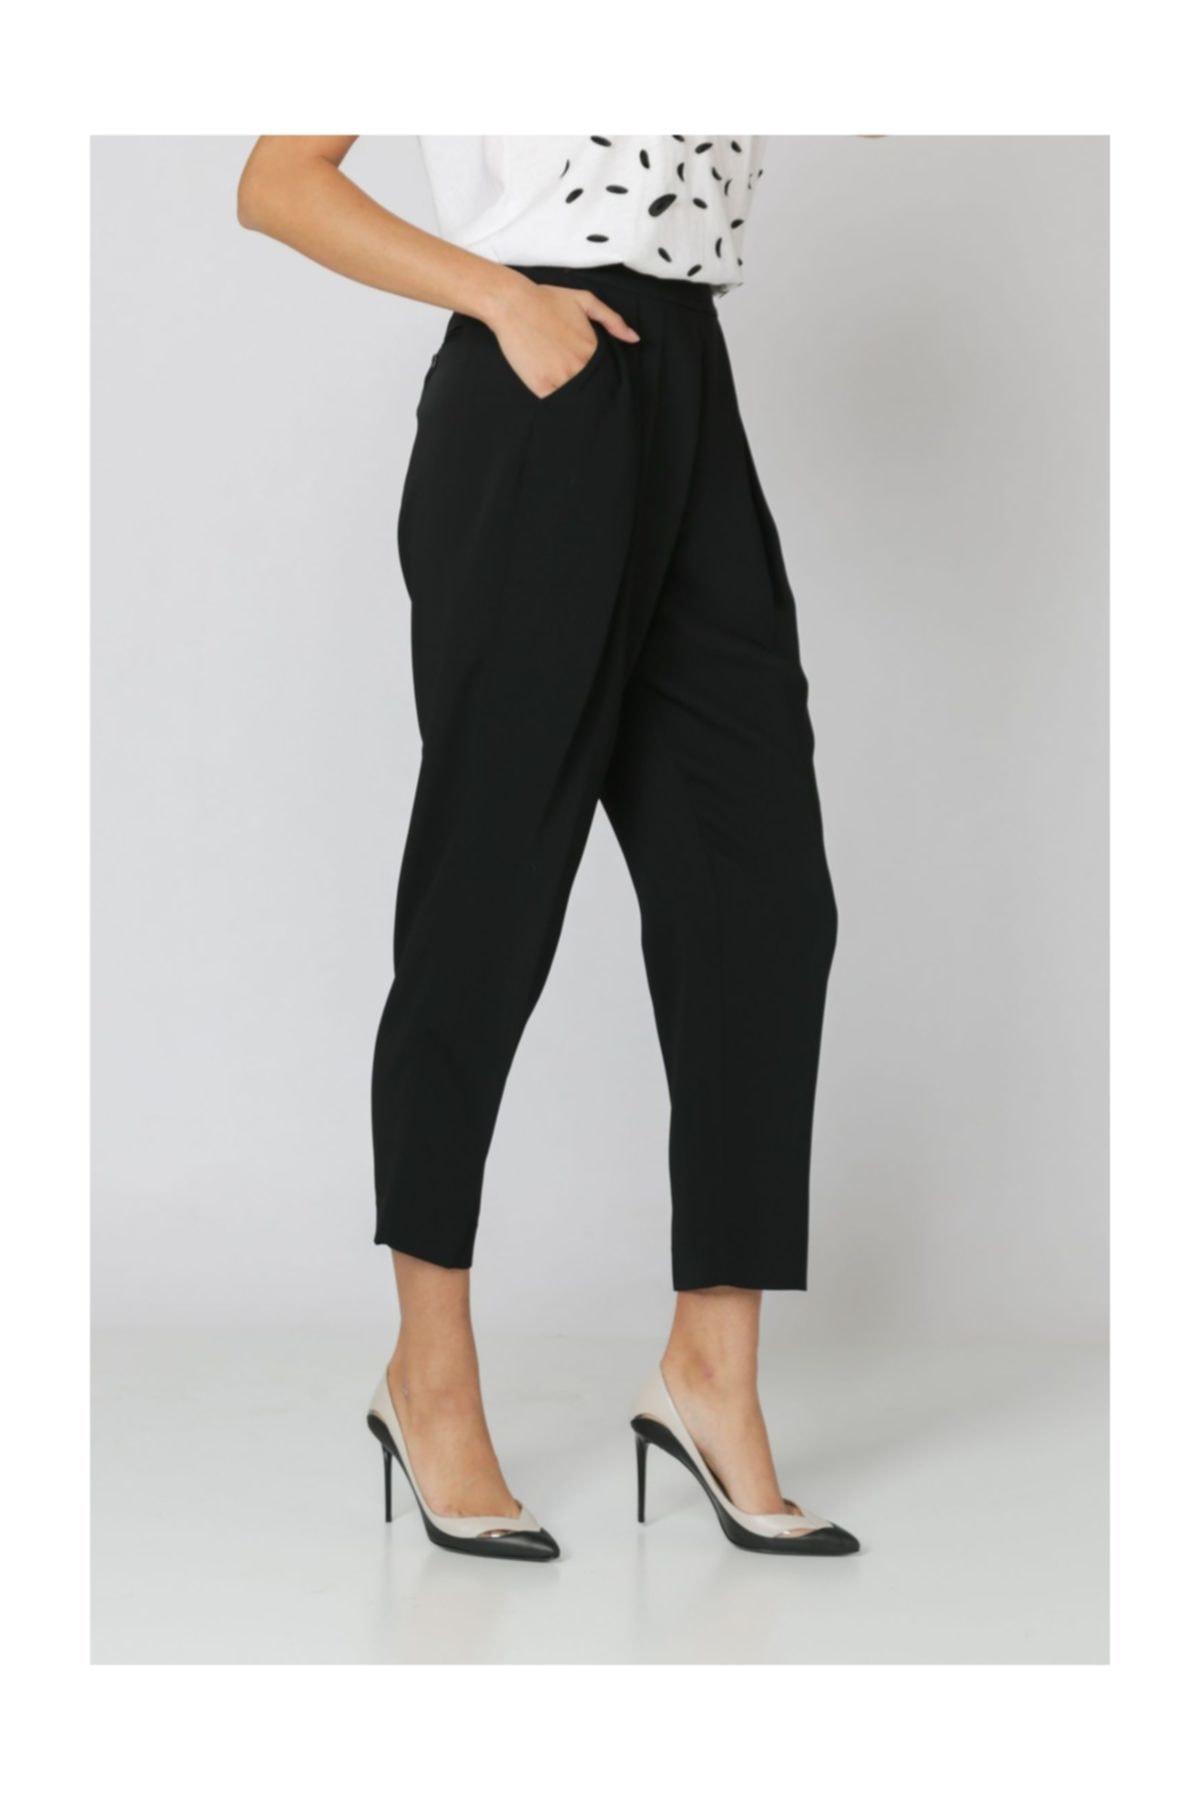 Armani Jeans Armanı Jeans Yüksek Bel , Dar Paça Pantolon 1